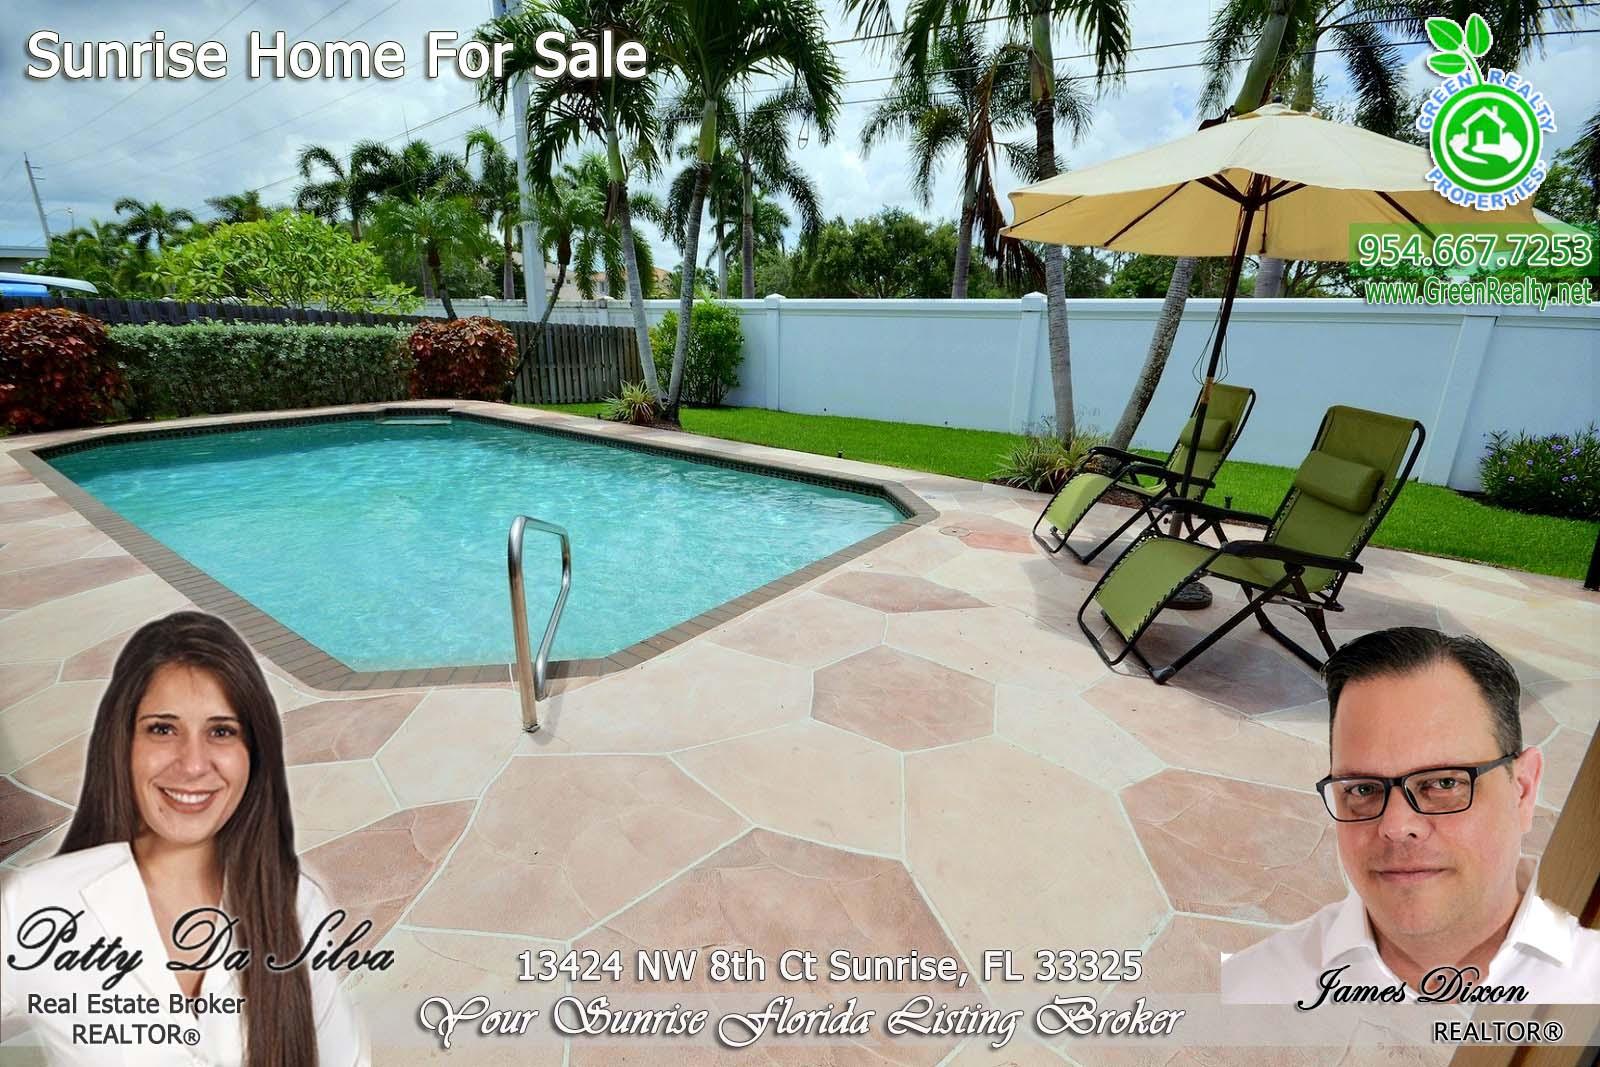 29 Sunrise Florida Homes For Sale (5)